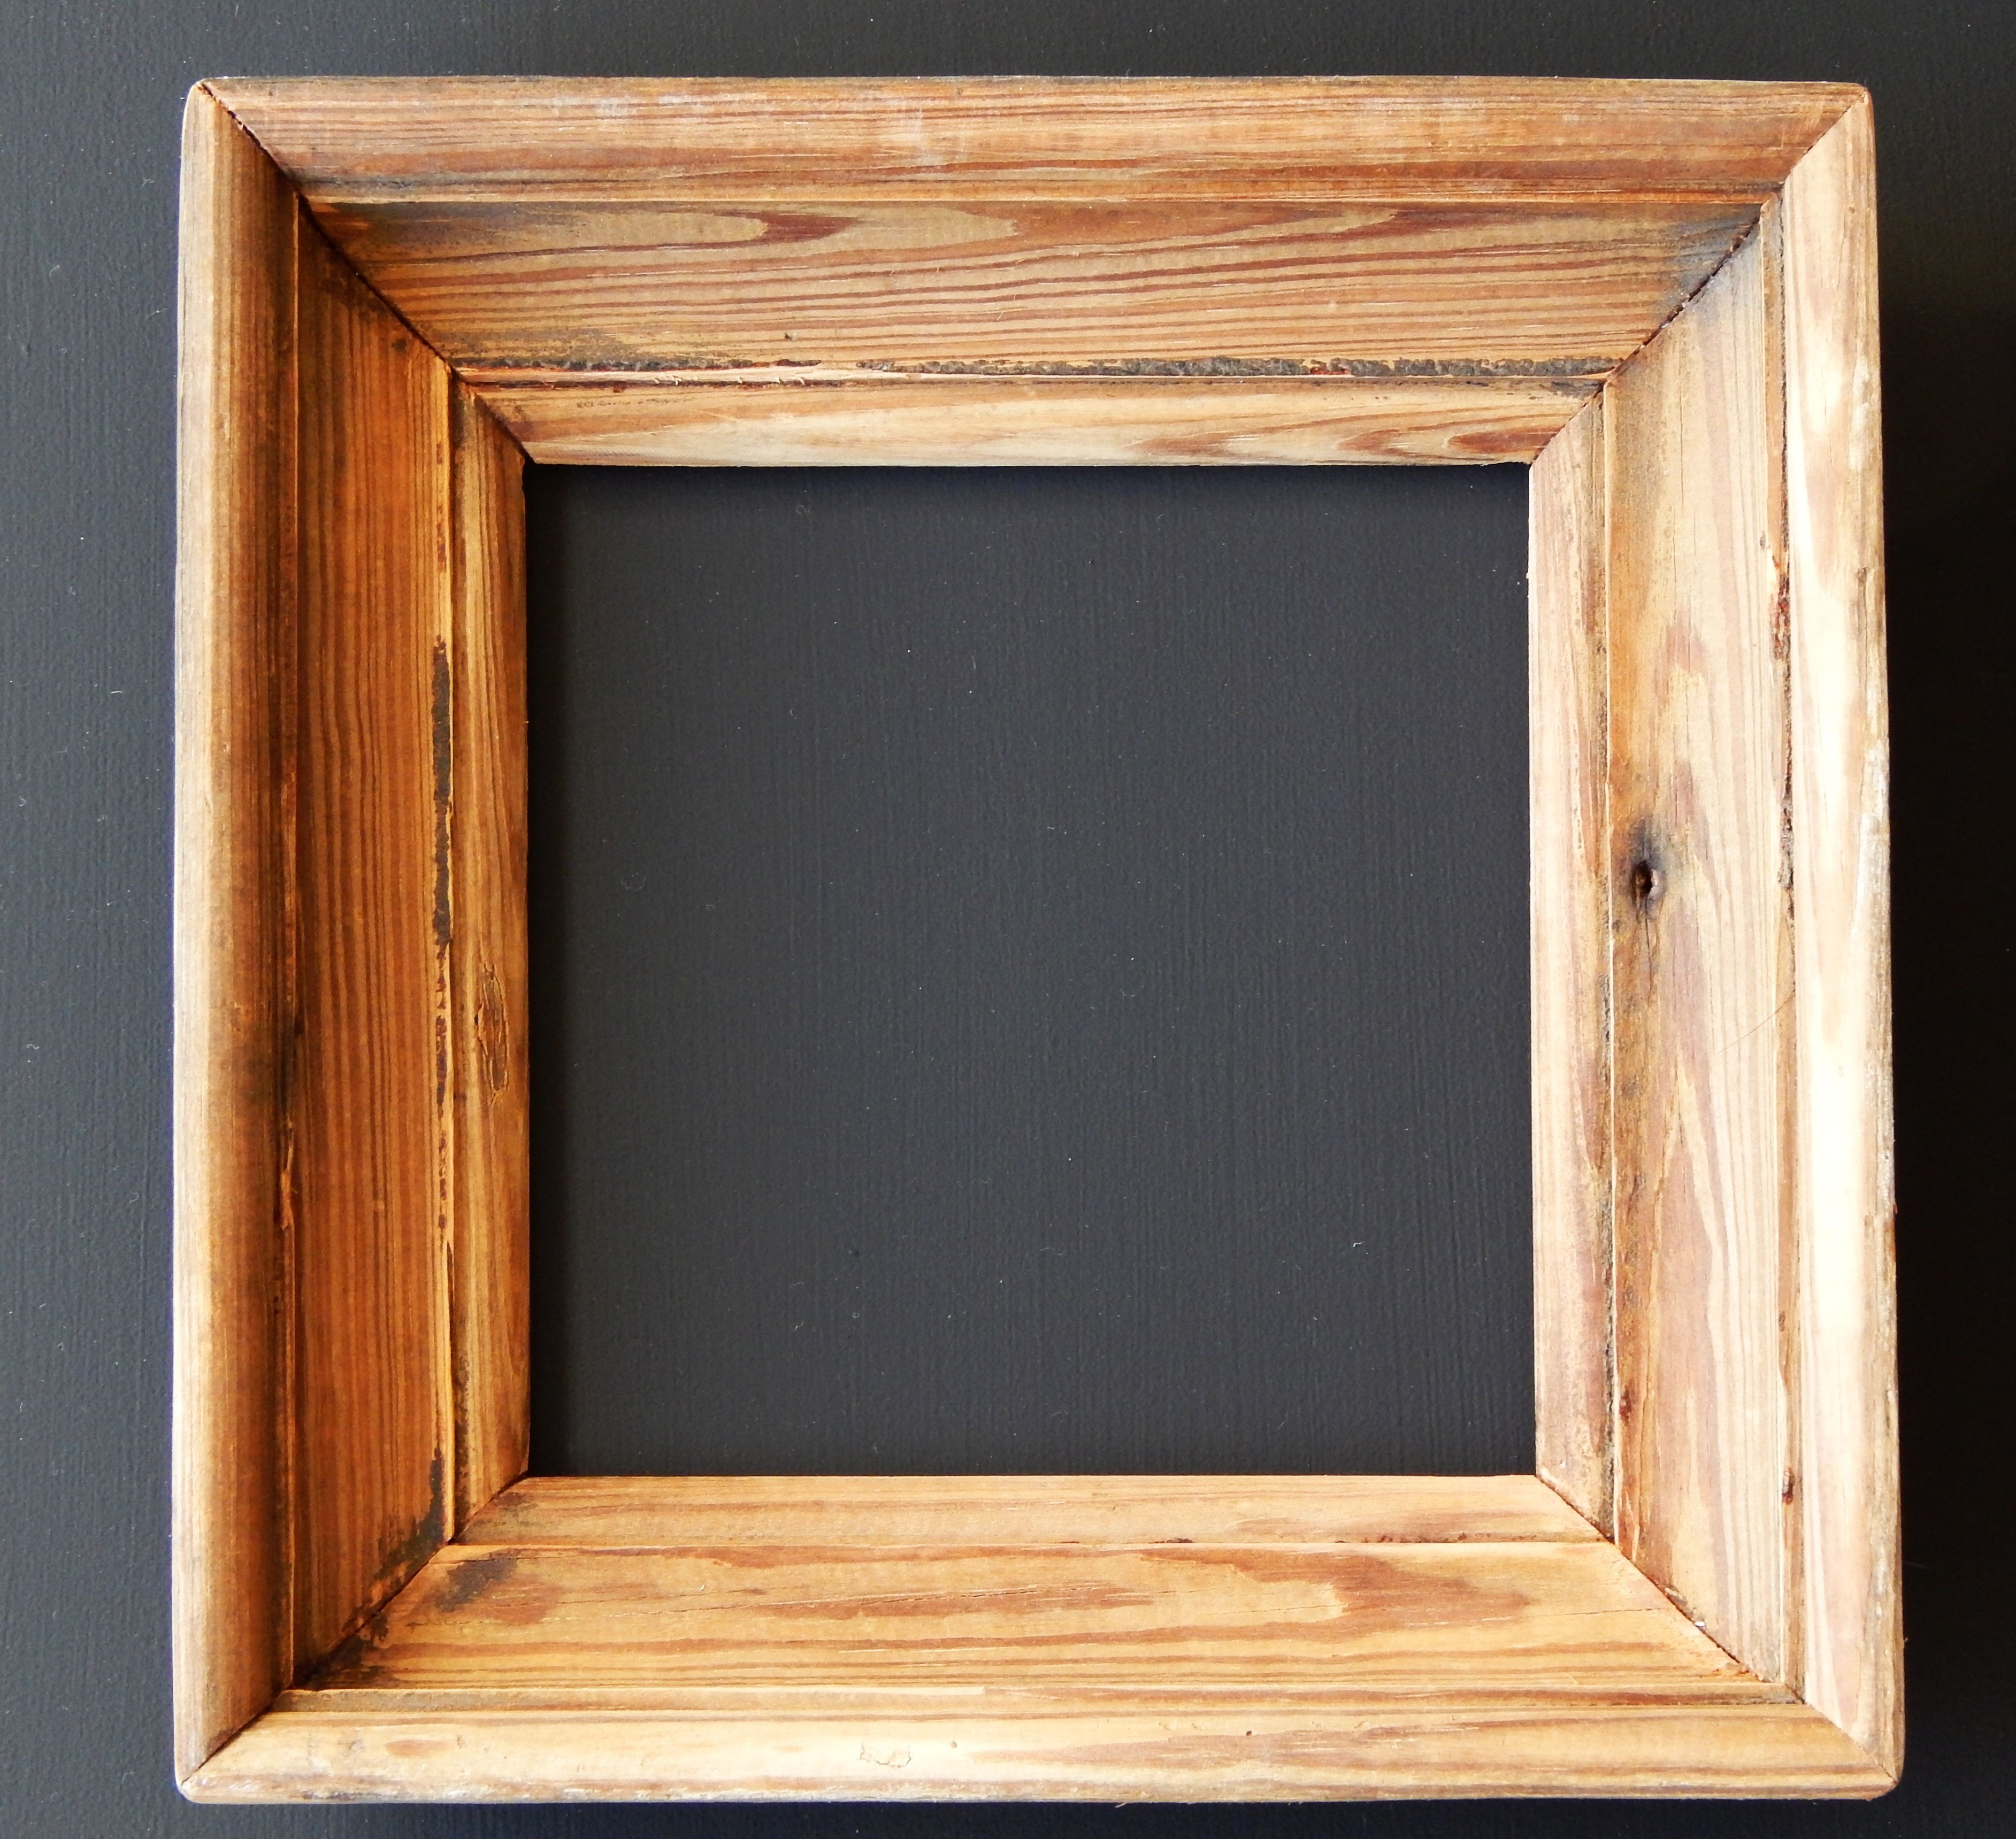 Marcos de madera pinotea objetos con pasado mesas espejos marcos pinterest - Marcos de madera ...